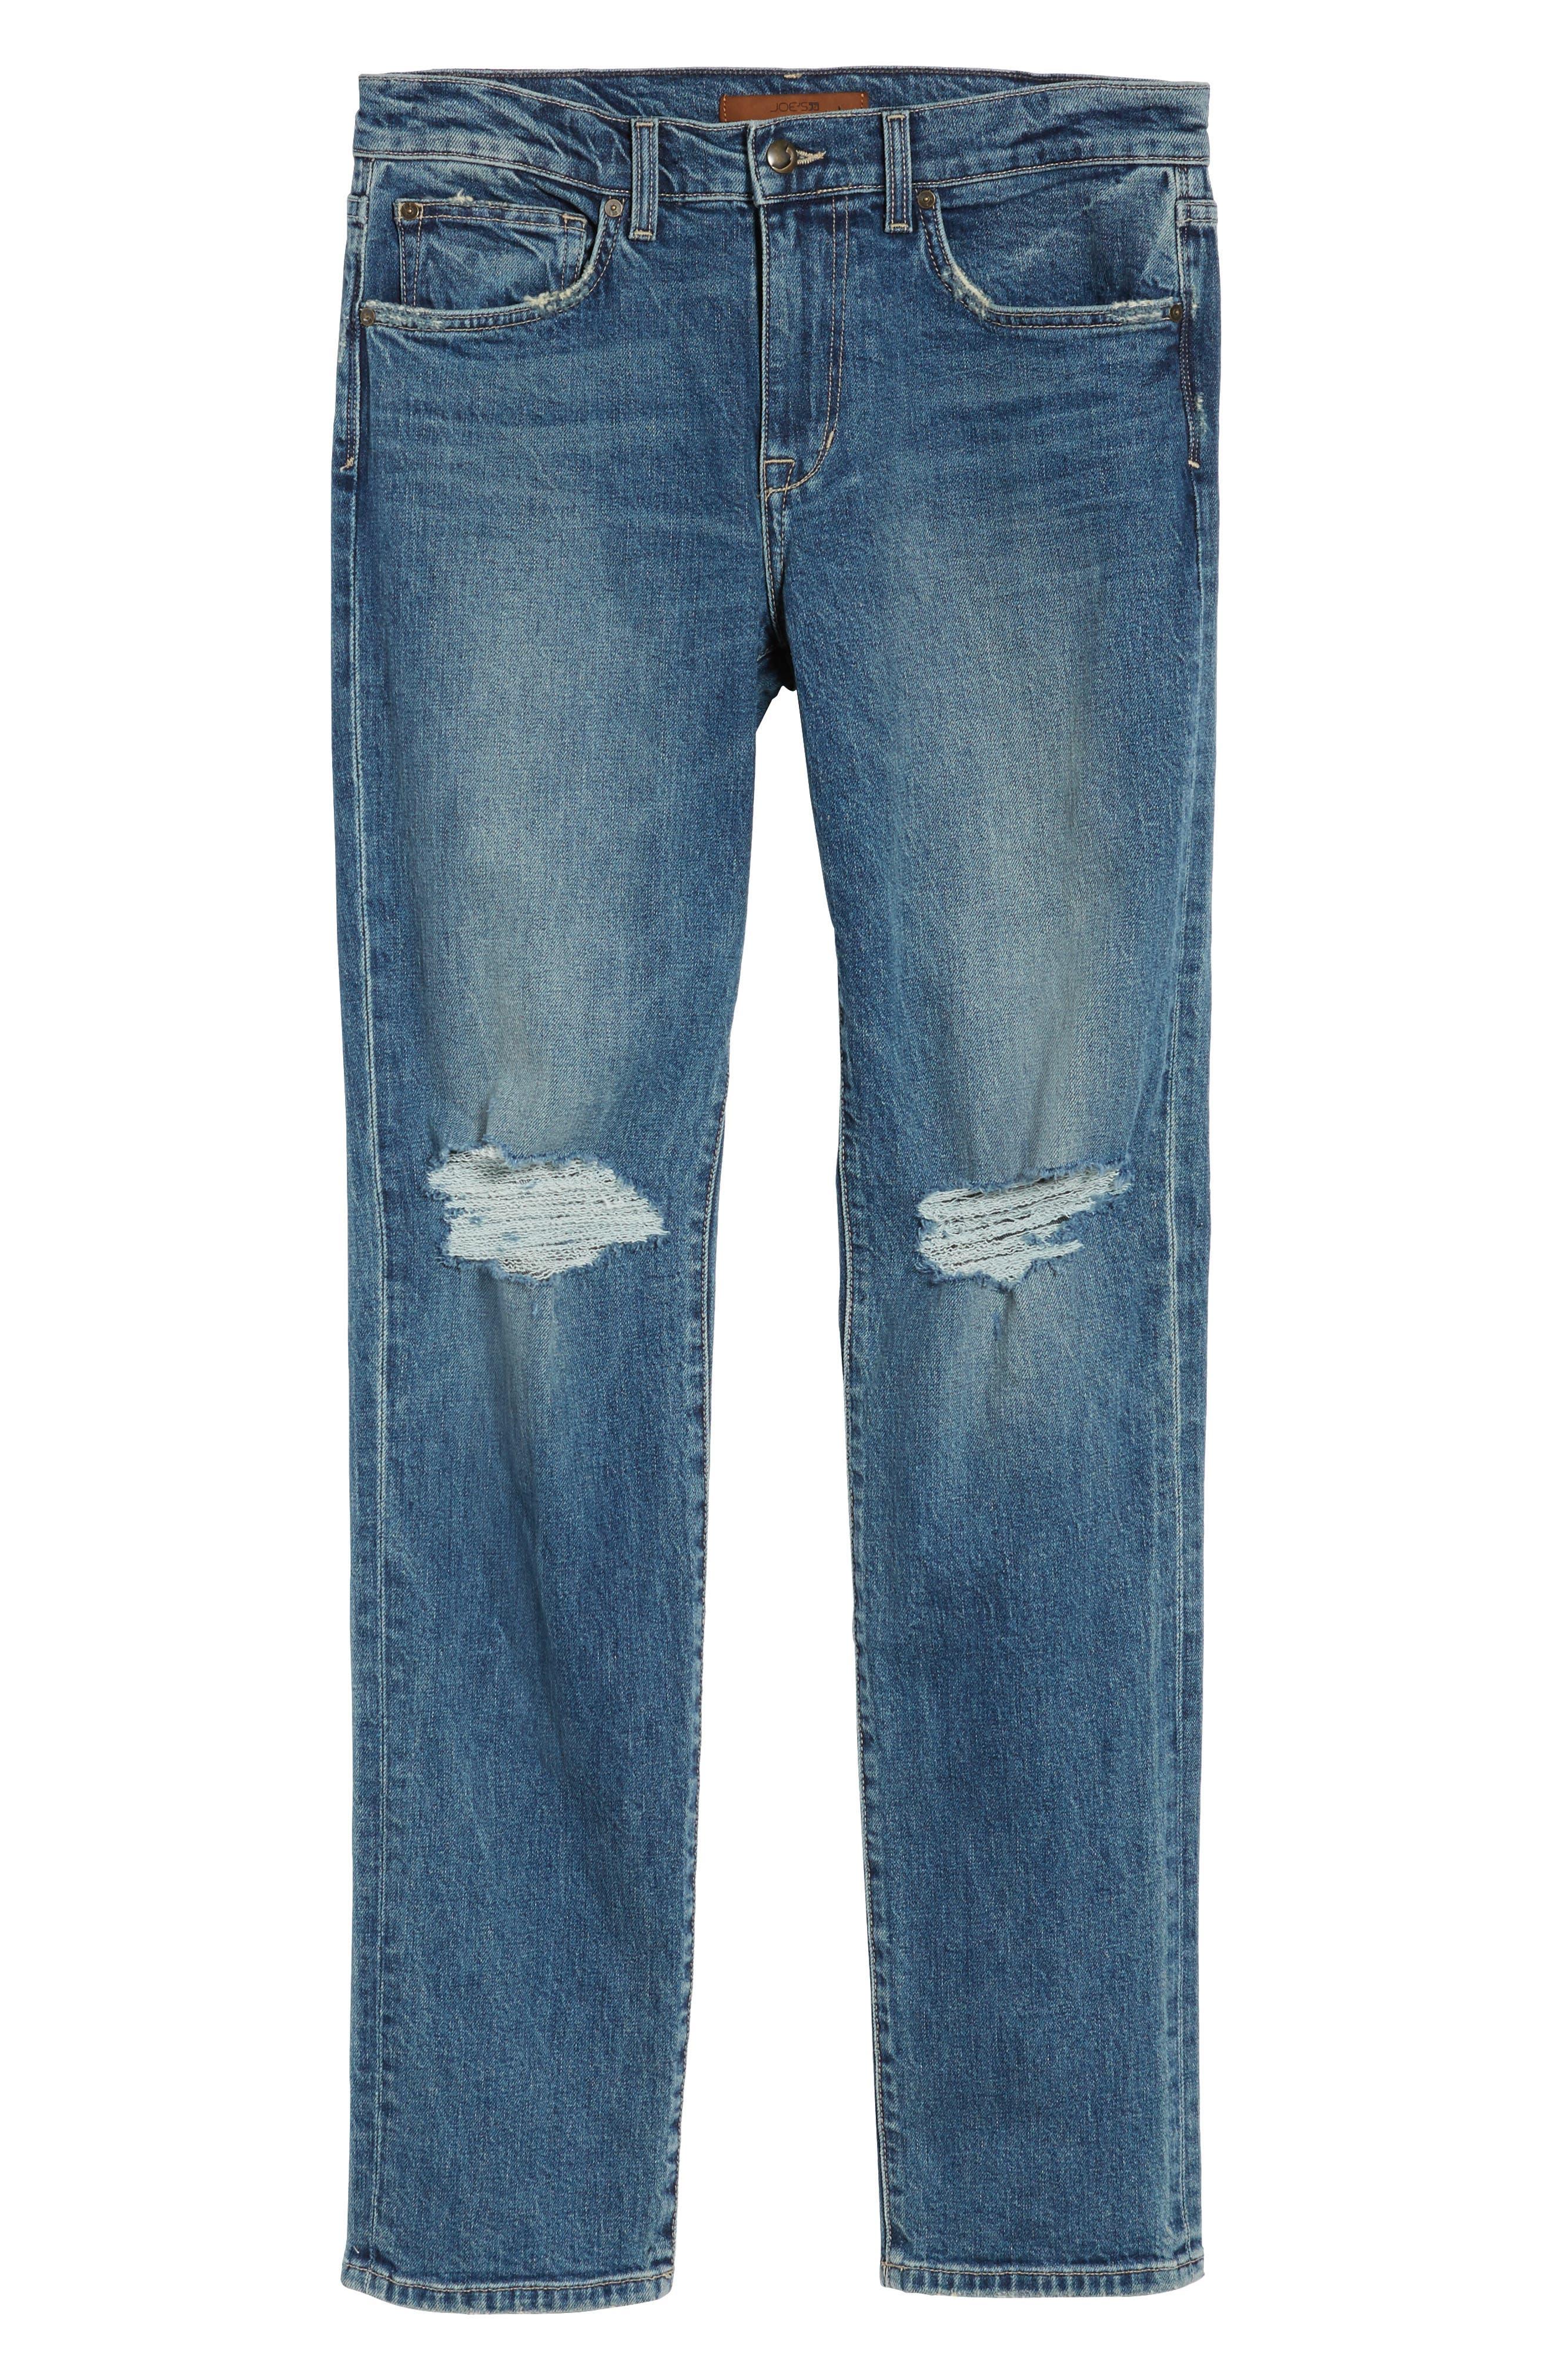 Slim Fit Jeans,                             Alternate thumbnail 6, color,                             Olson